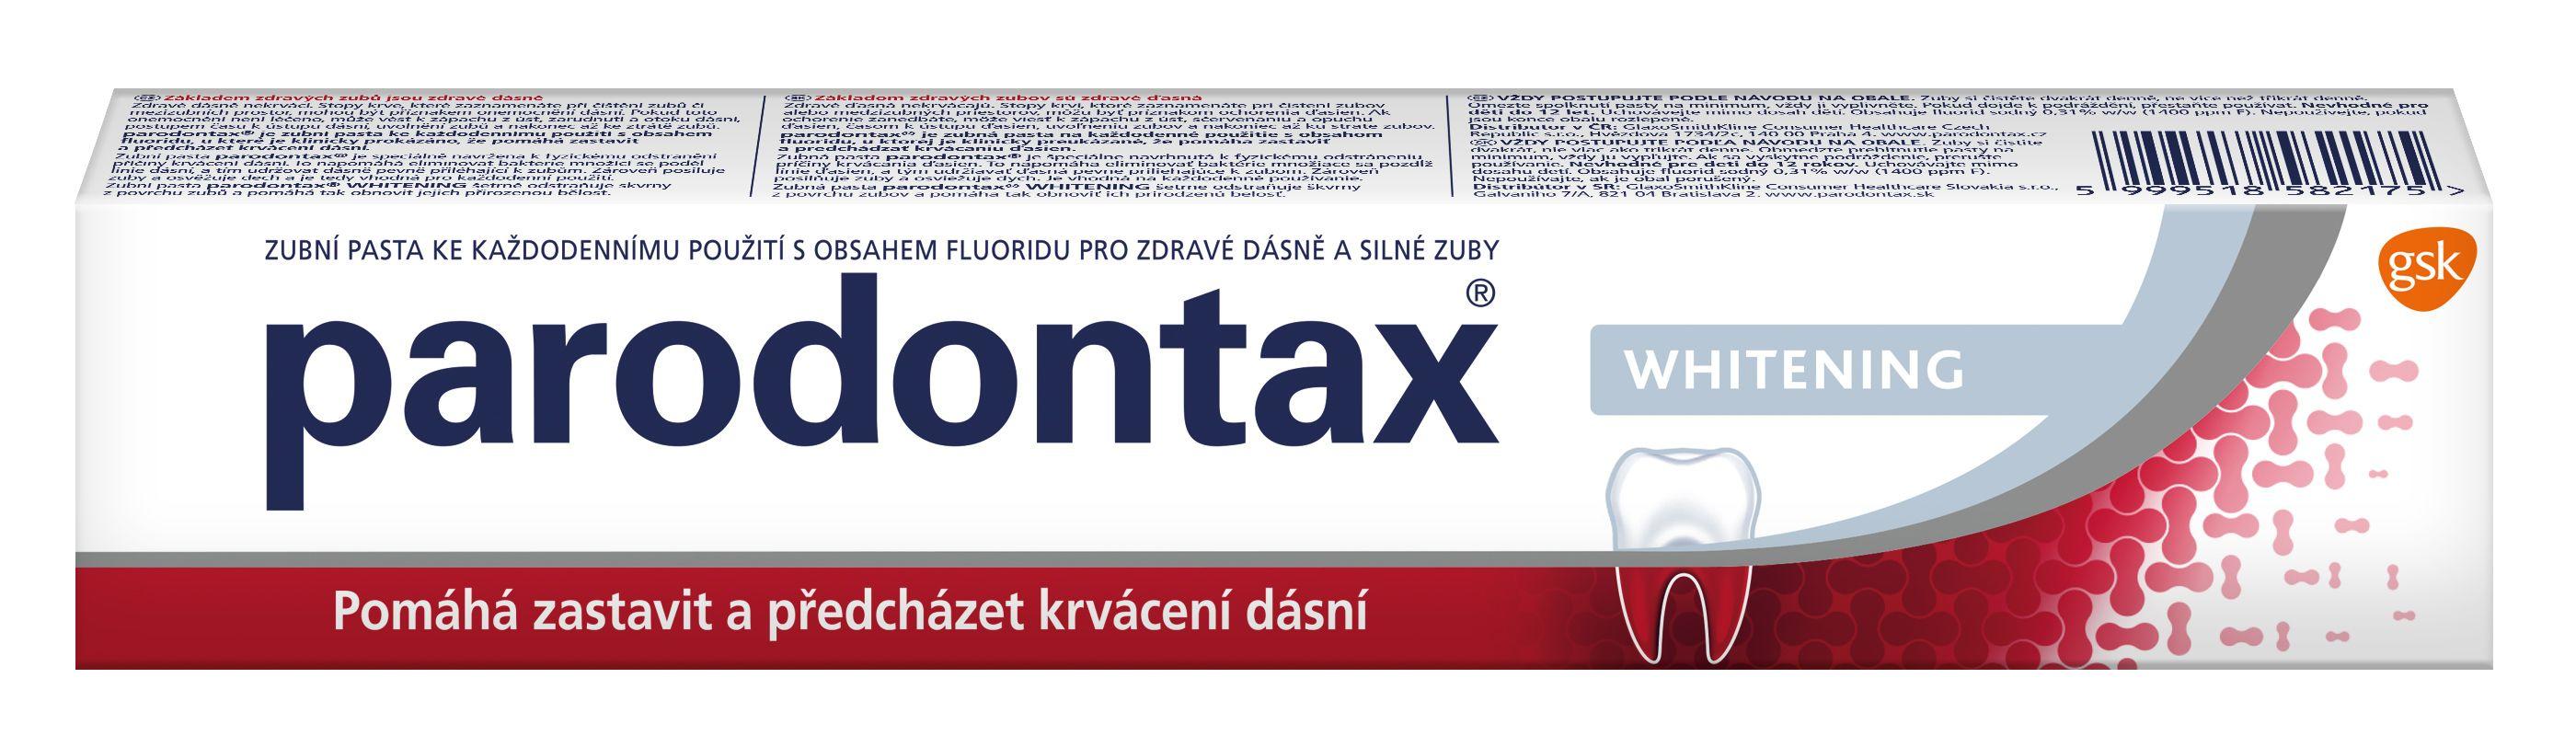 Parodontax Whitening zubní pasta 75 ml